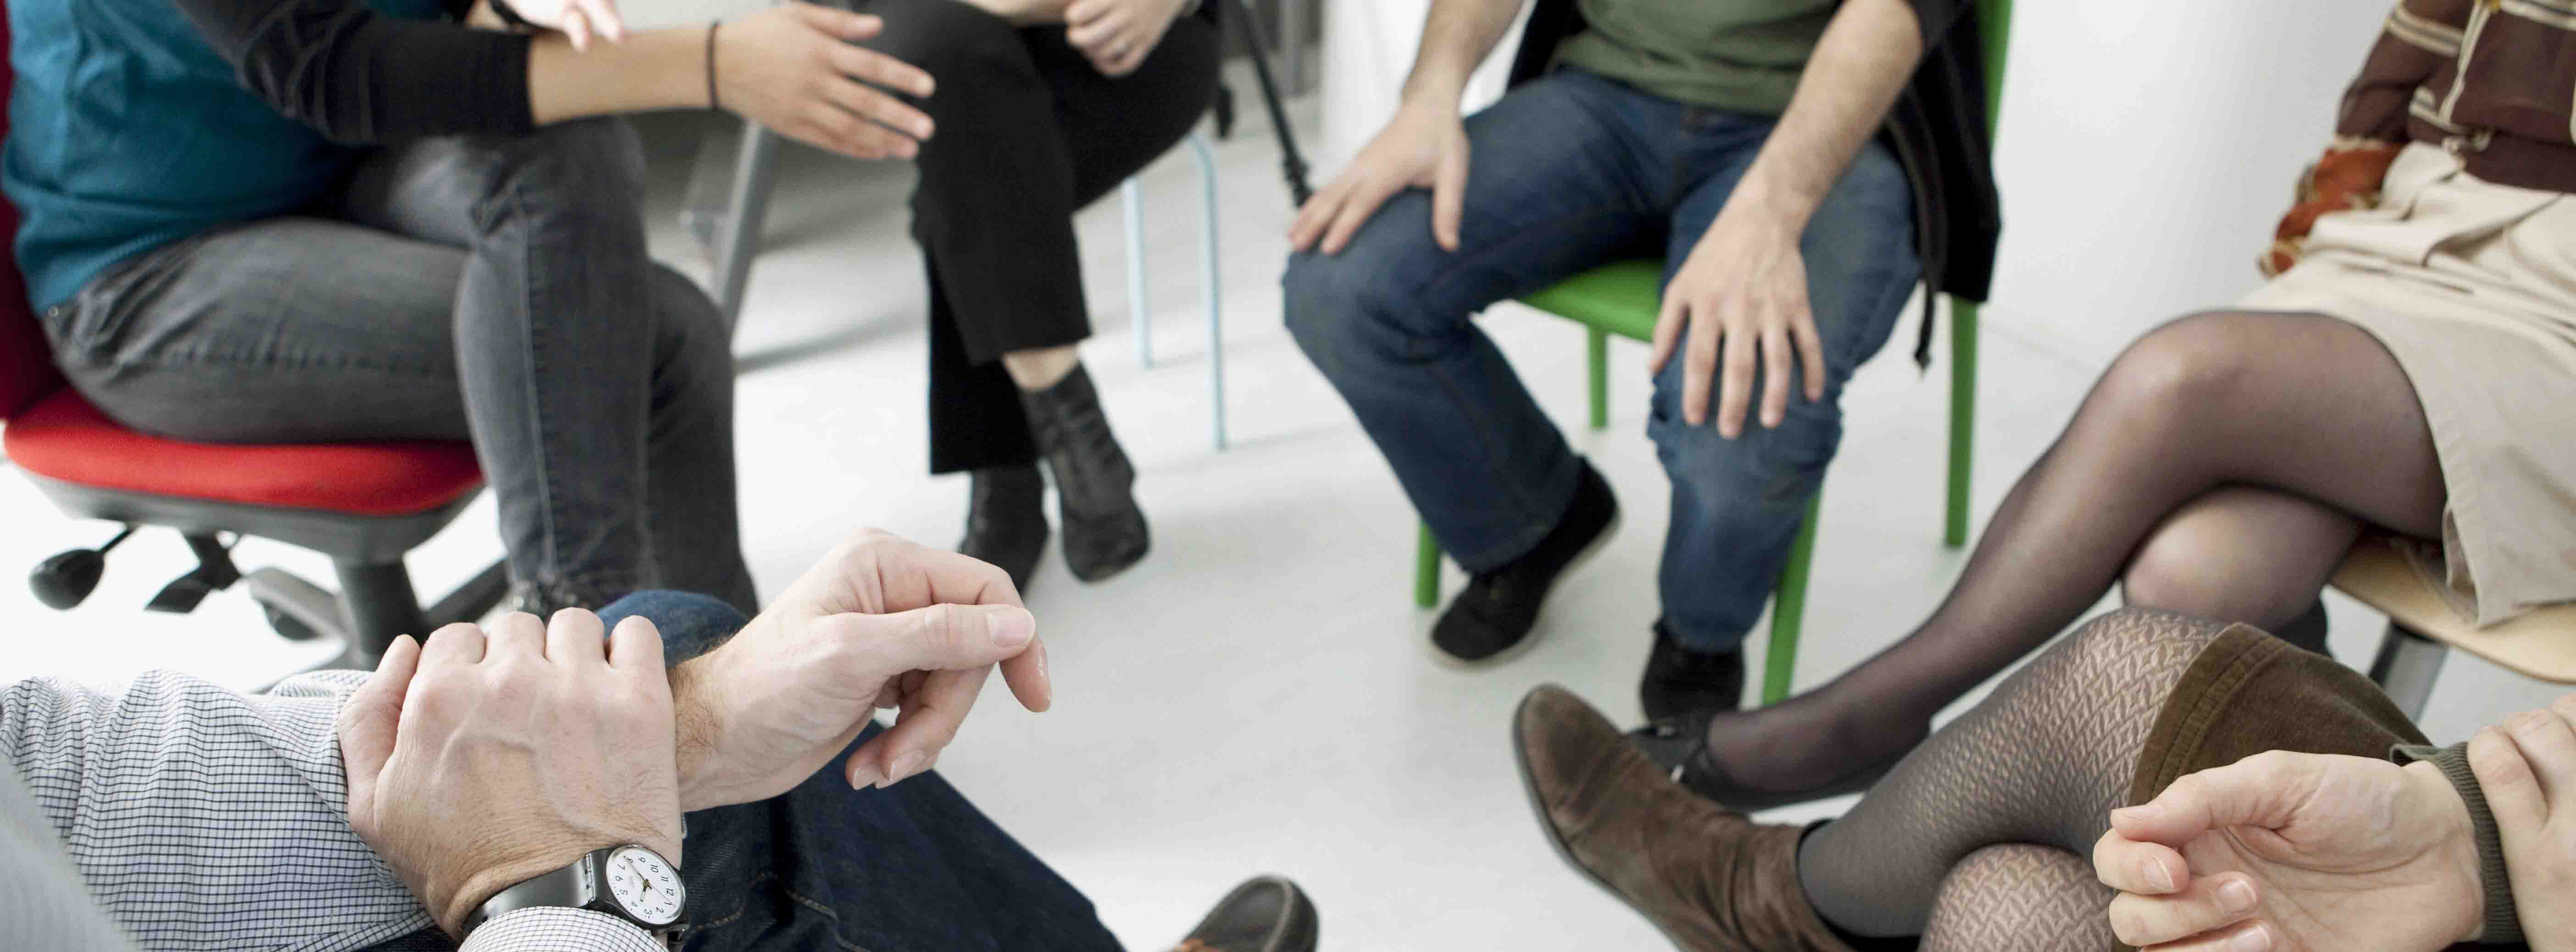 Psicoterapia de grupo o terapia de grupo - De Salud Psicólogos - José de Sola - psicólogos en Madrid - Psicólogos en Málaga